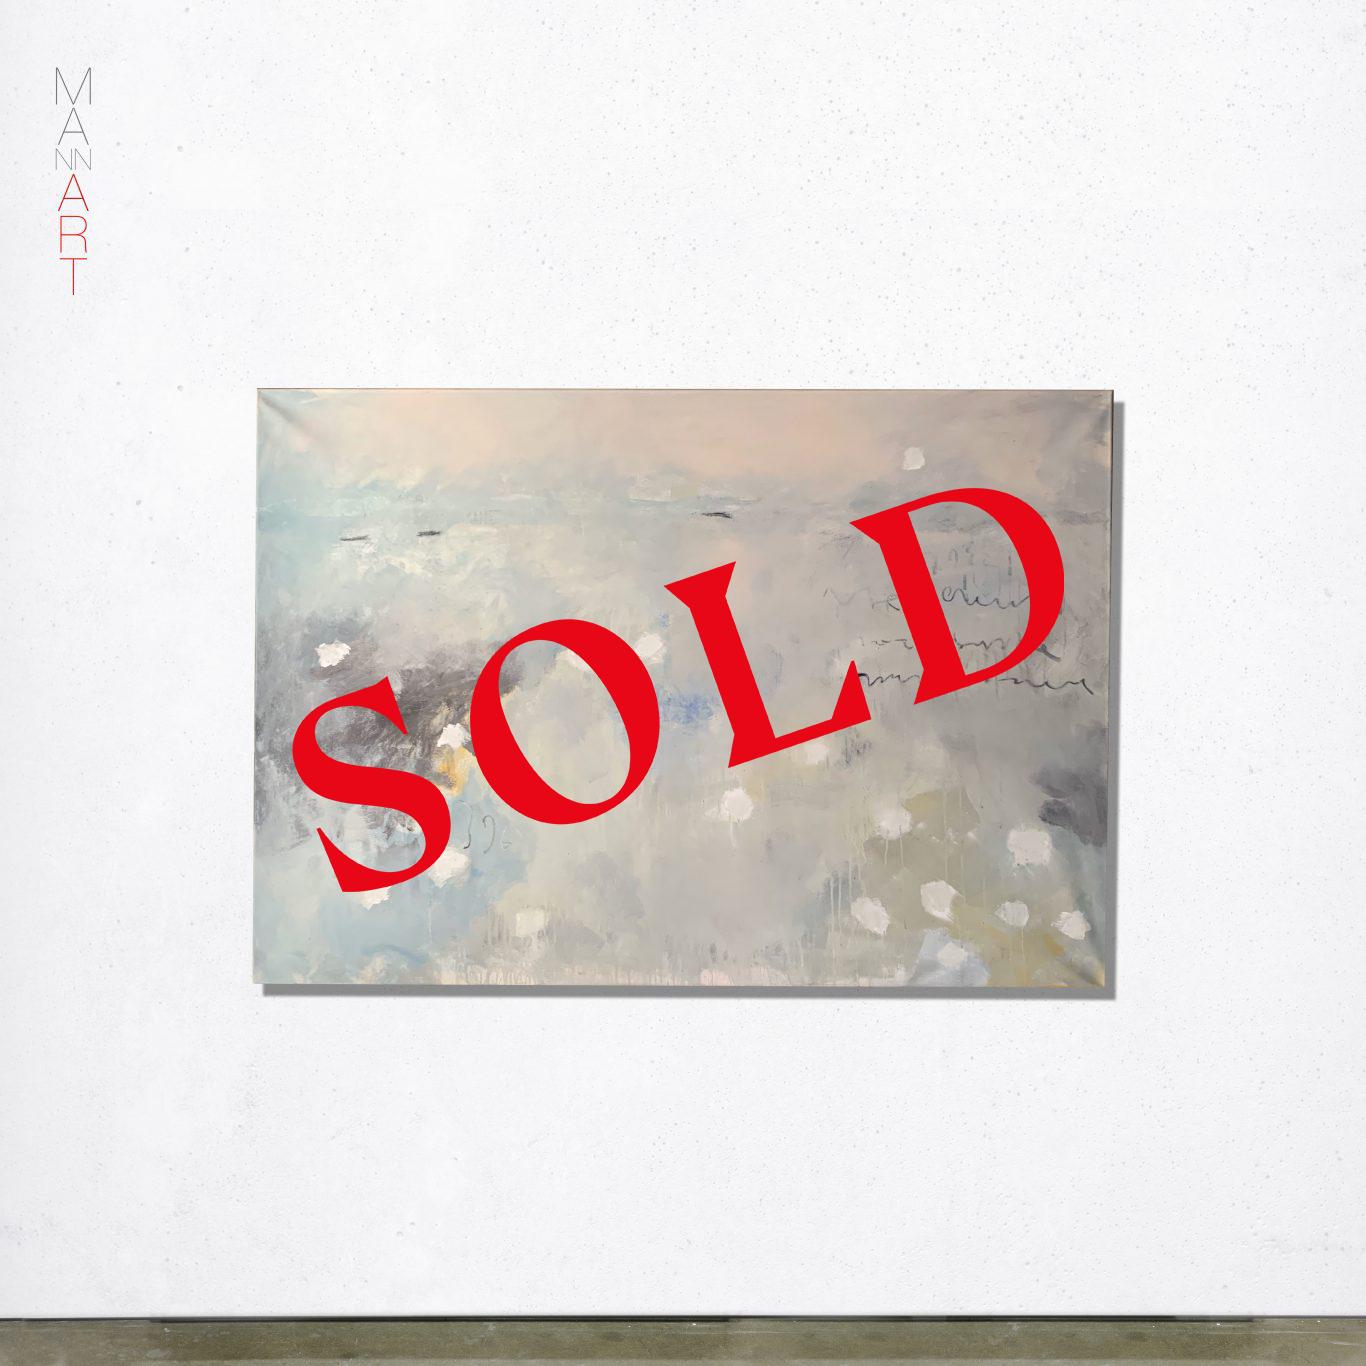 MANNA Art Saudade 2 / Summer rain 2 - Sold